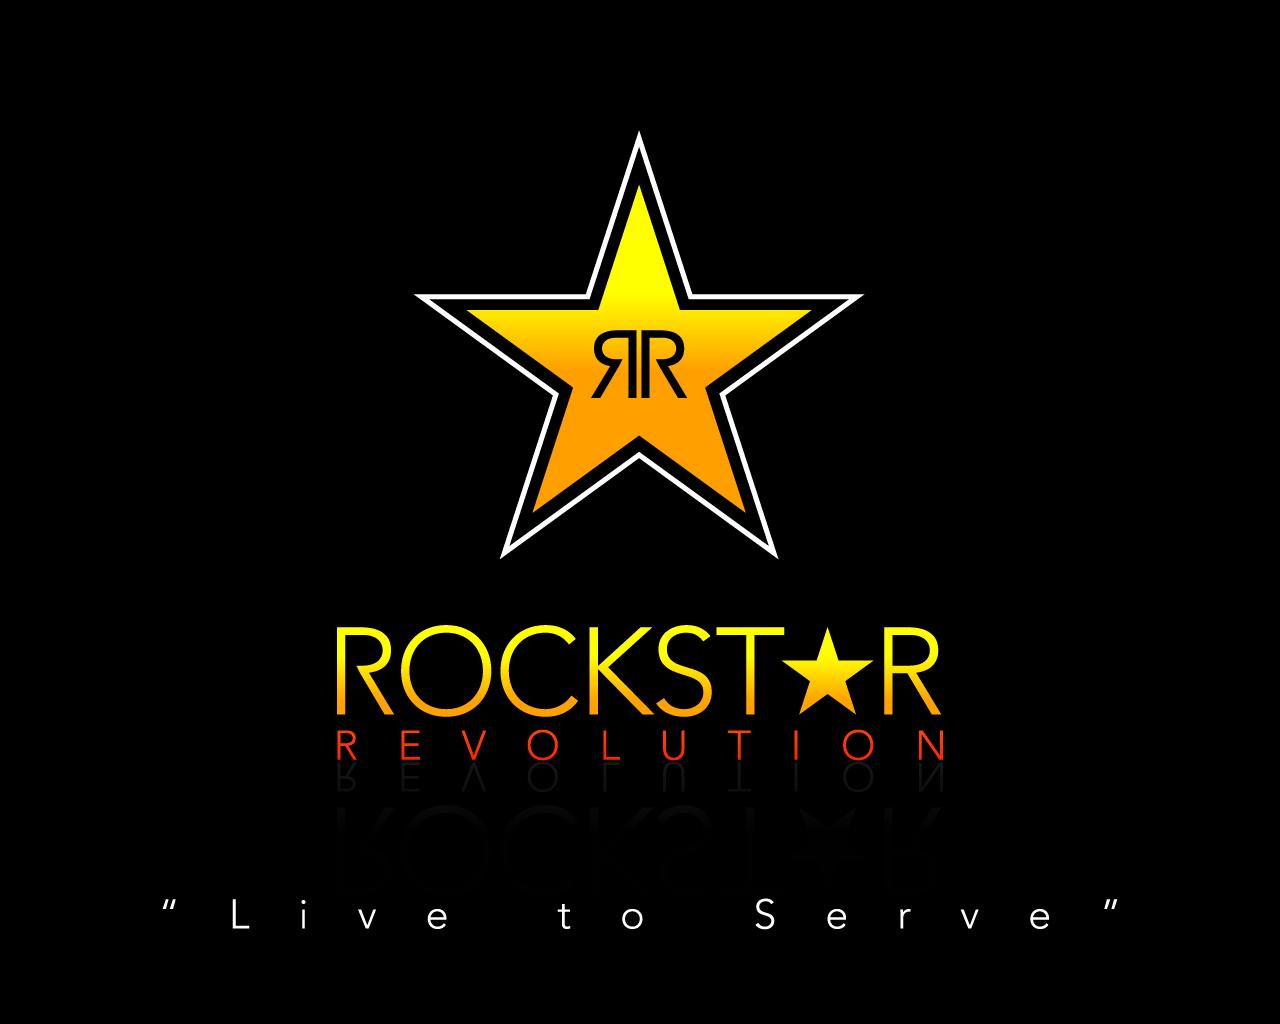 Rockstar Logo Wallpaper Wallpapersafari